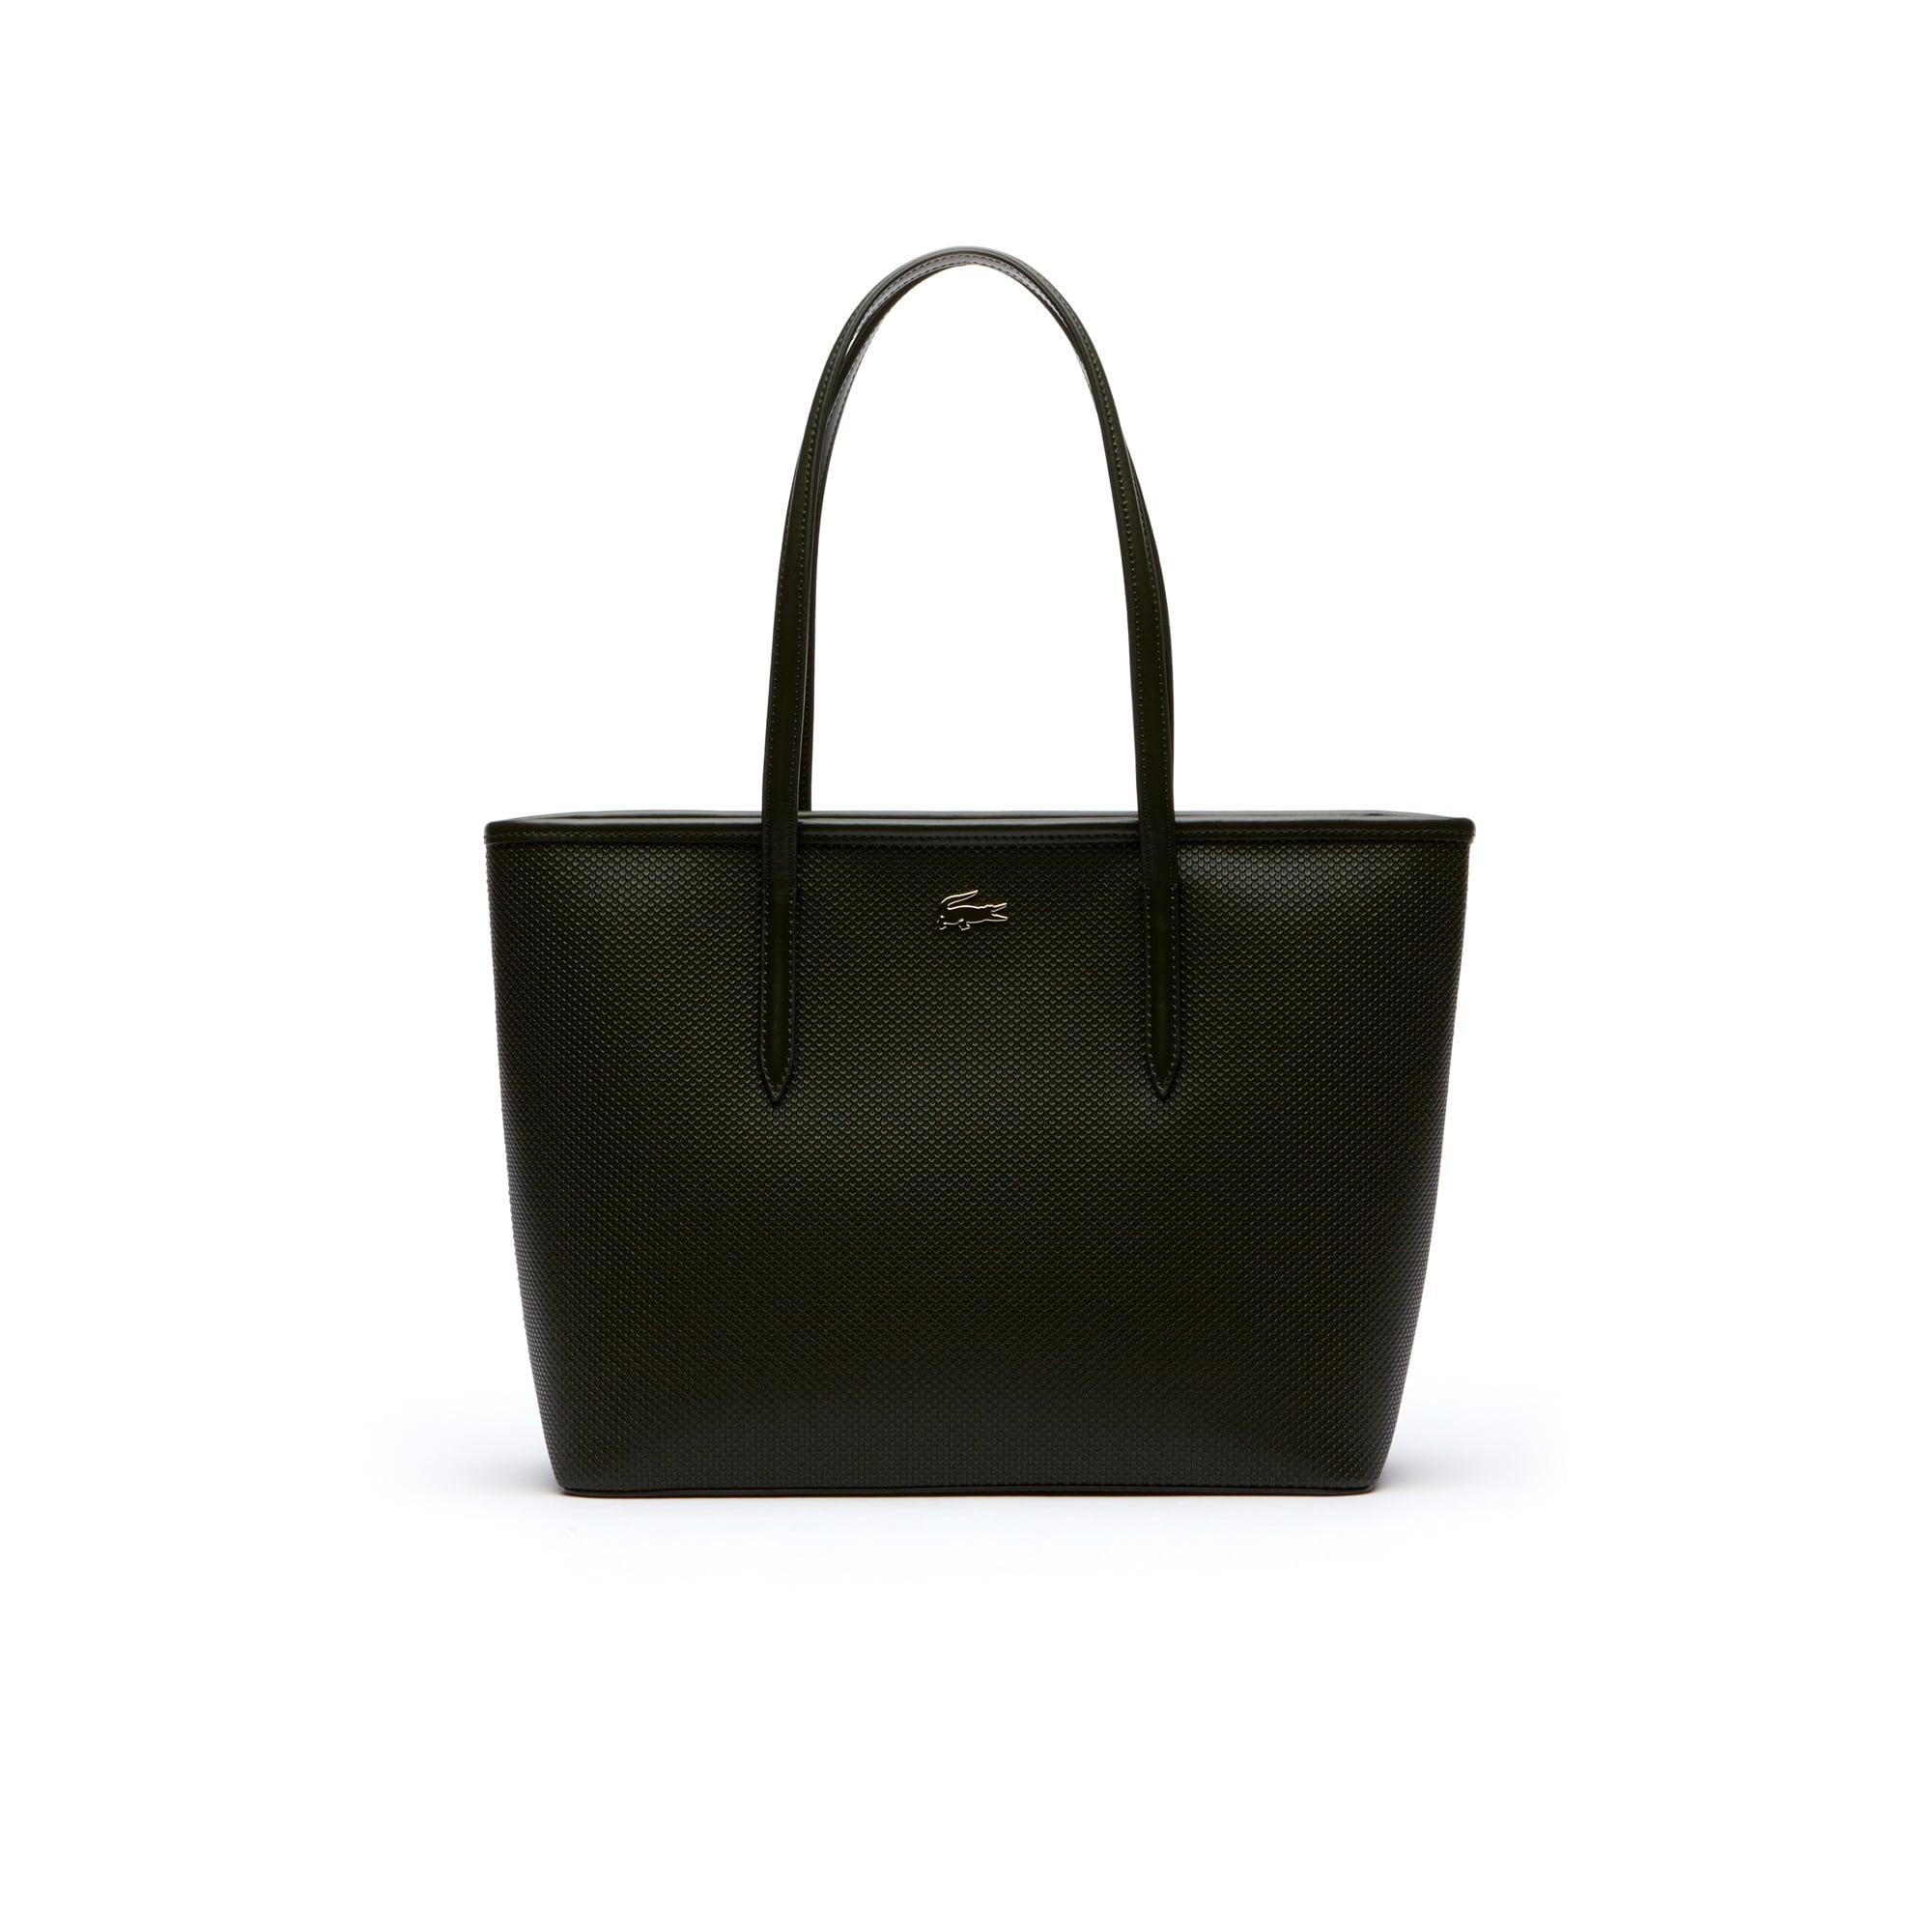 Damen-Tote-Bag CHANTACO aus Piqué-Leder mit Reißverschluss